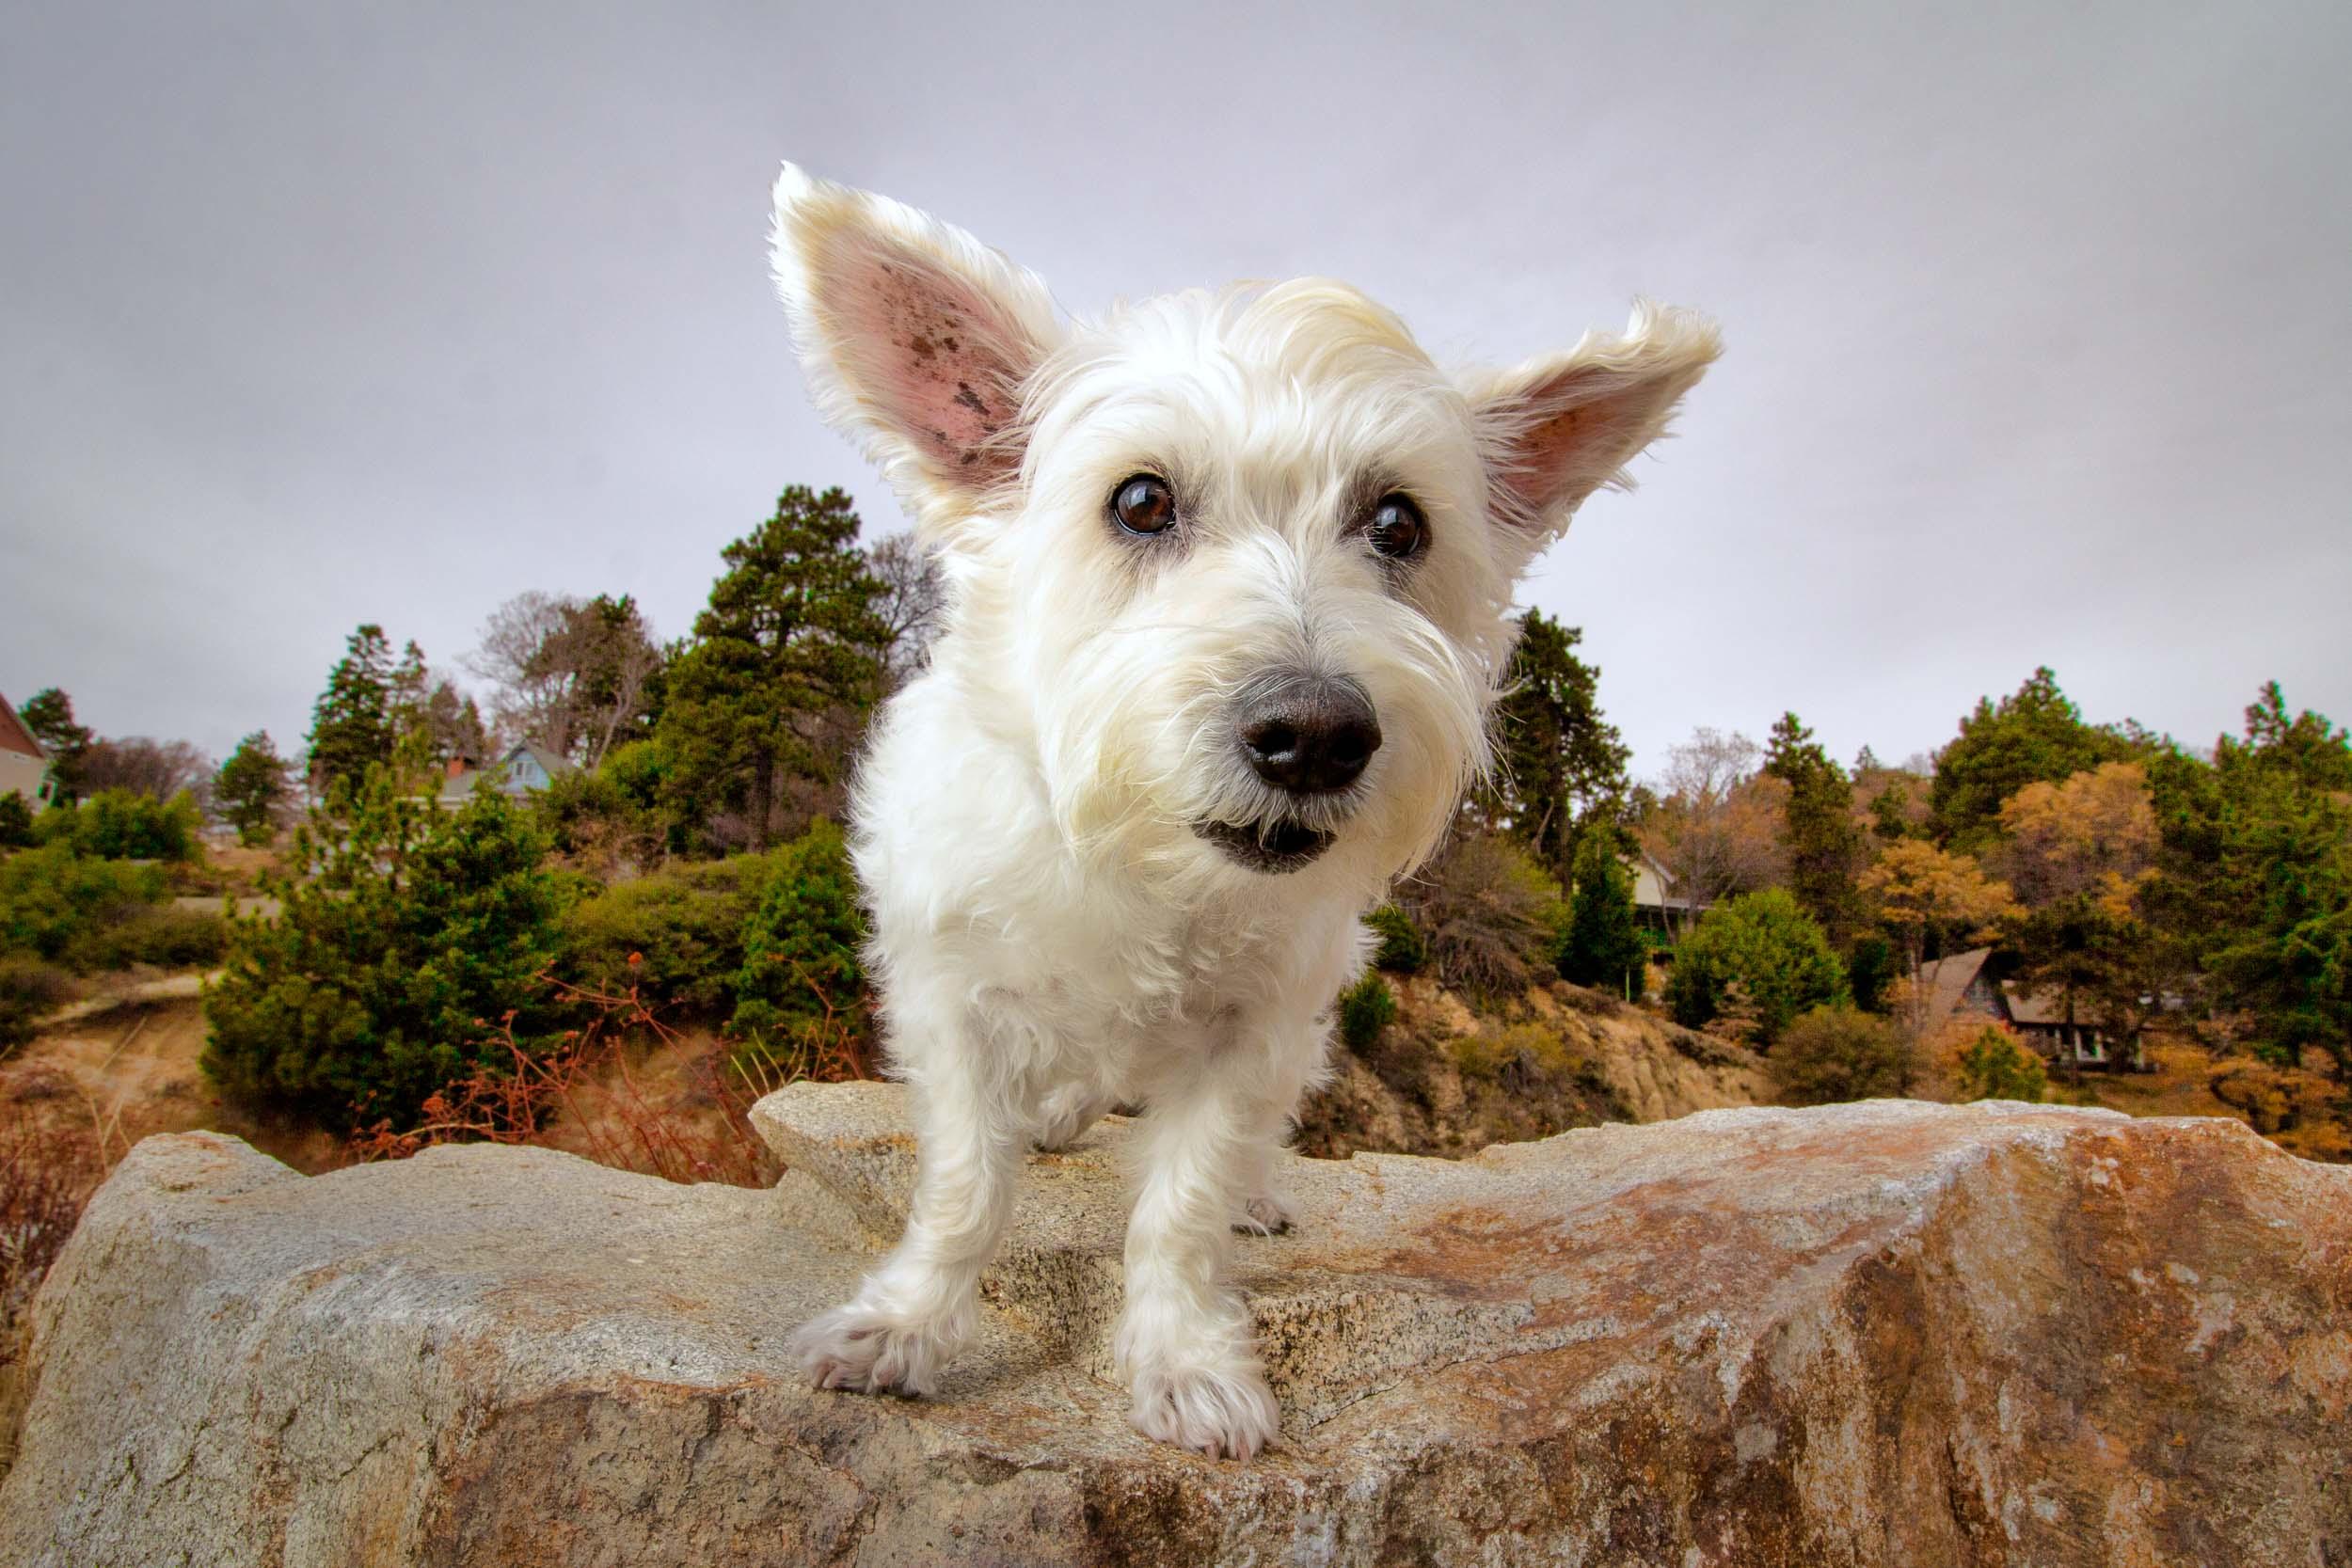 23-Orange-County-Dog-Photographer-Southern-California-Steamer-Lee.JPG